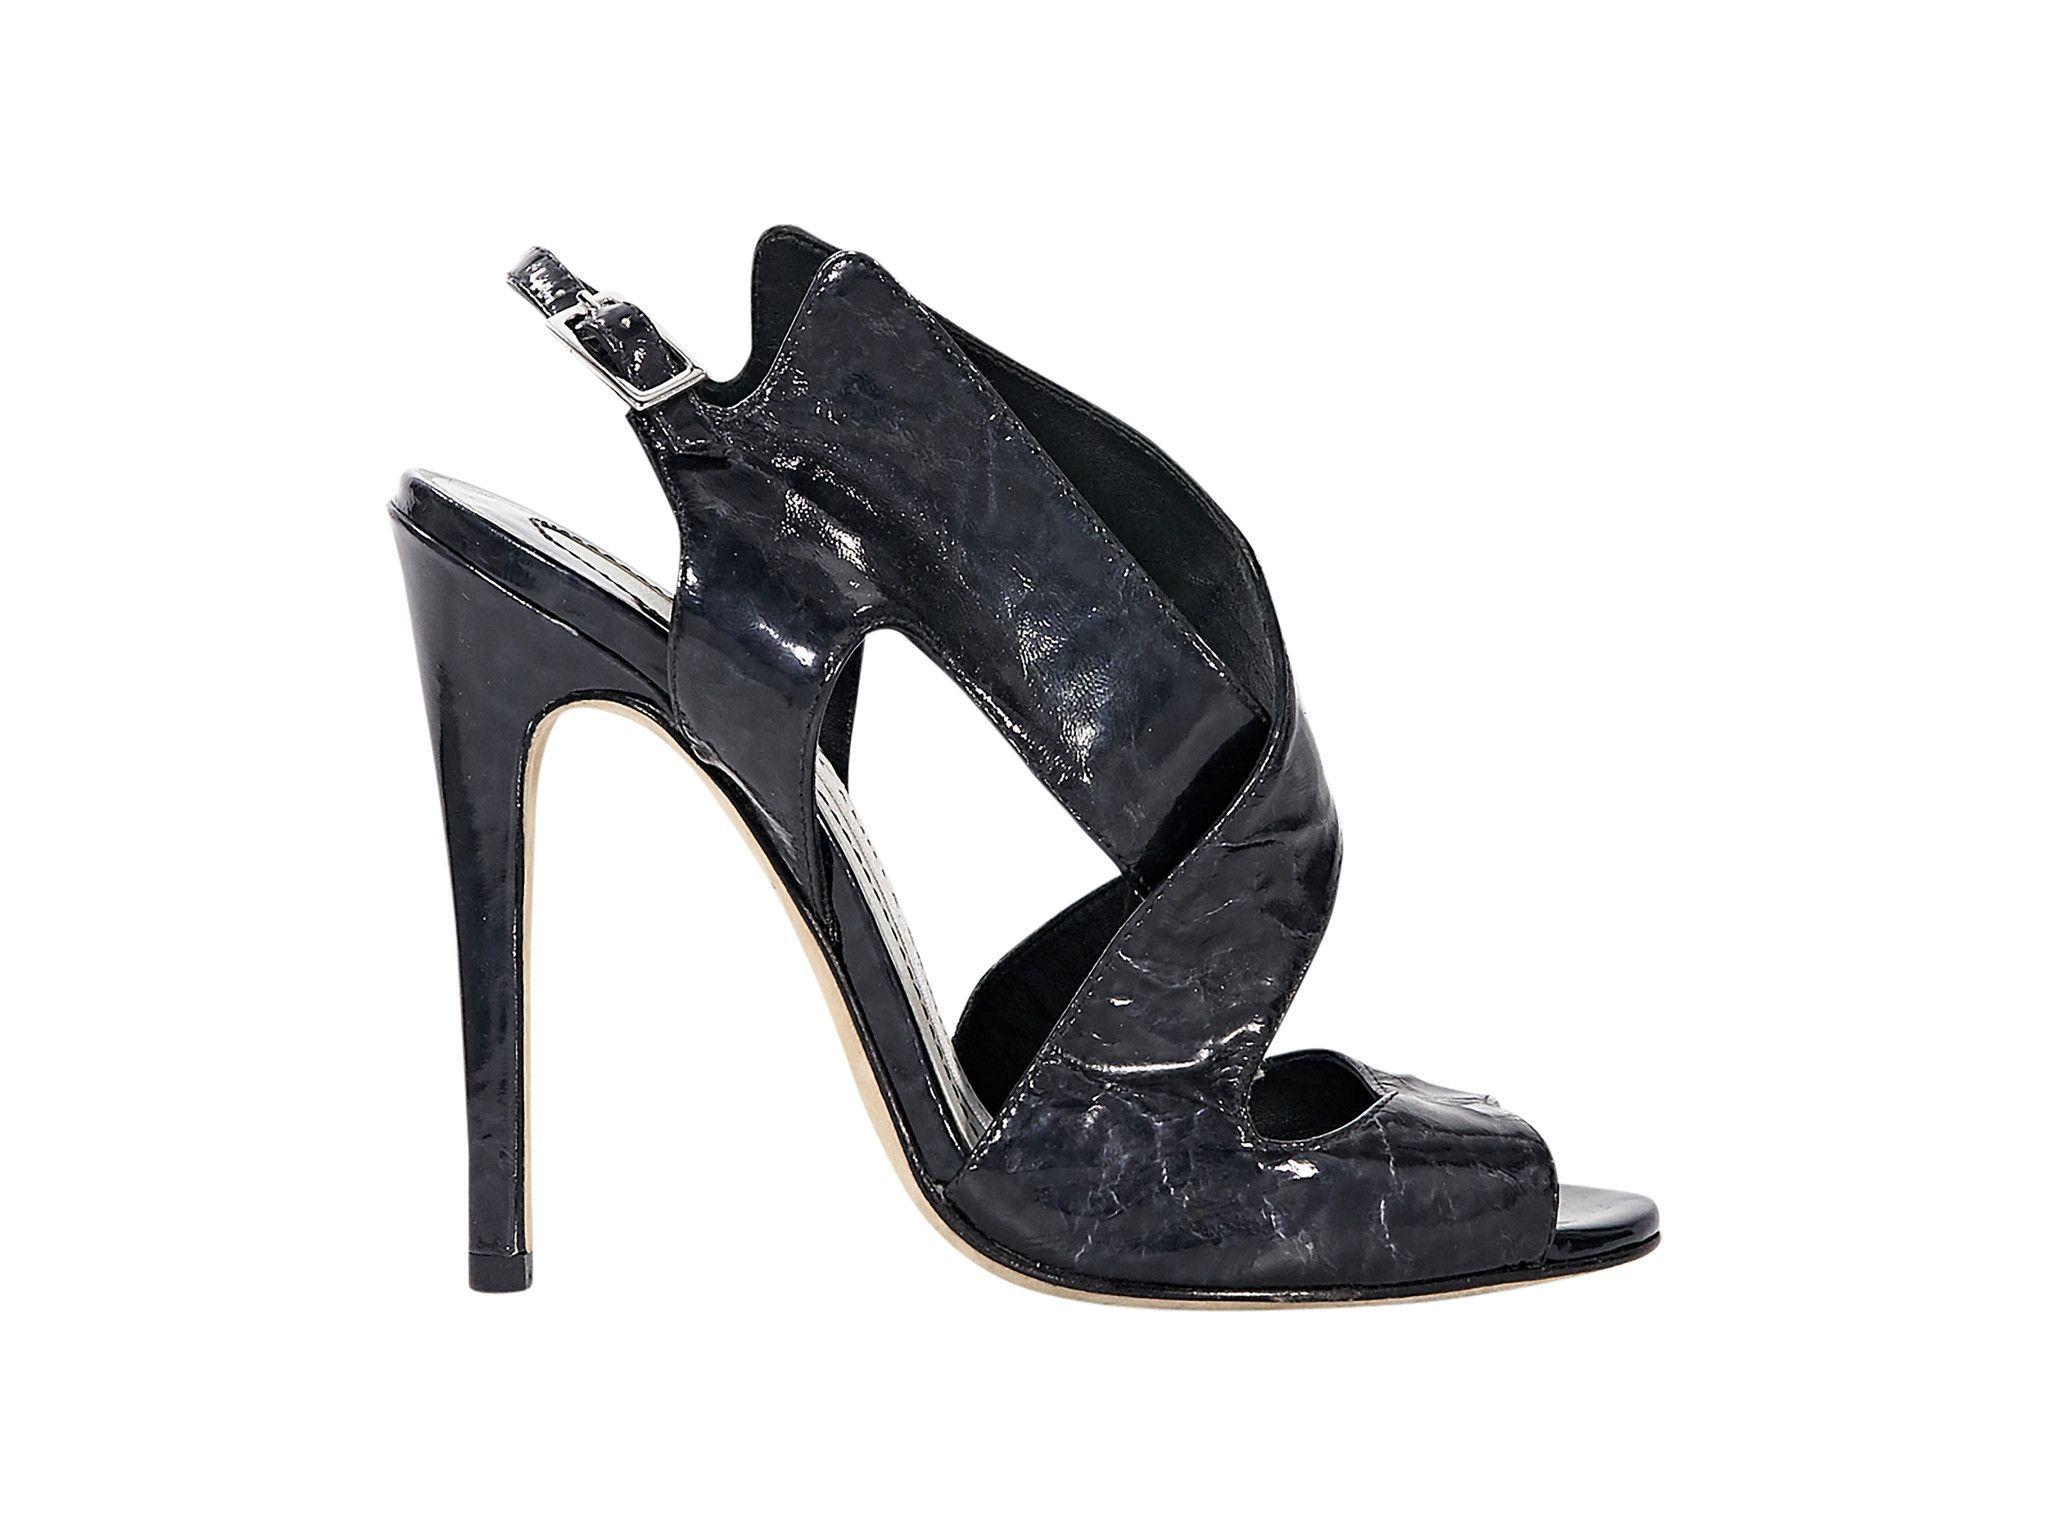 CAMILLA SKOVGAARD Patent Leather Heels BjCLFJv1